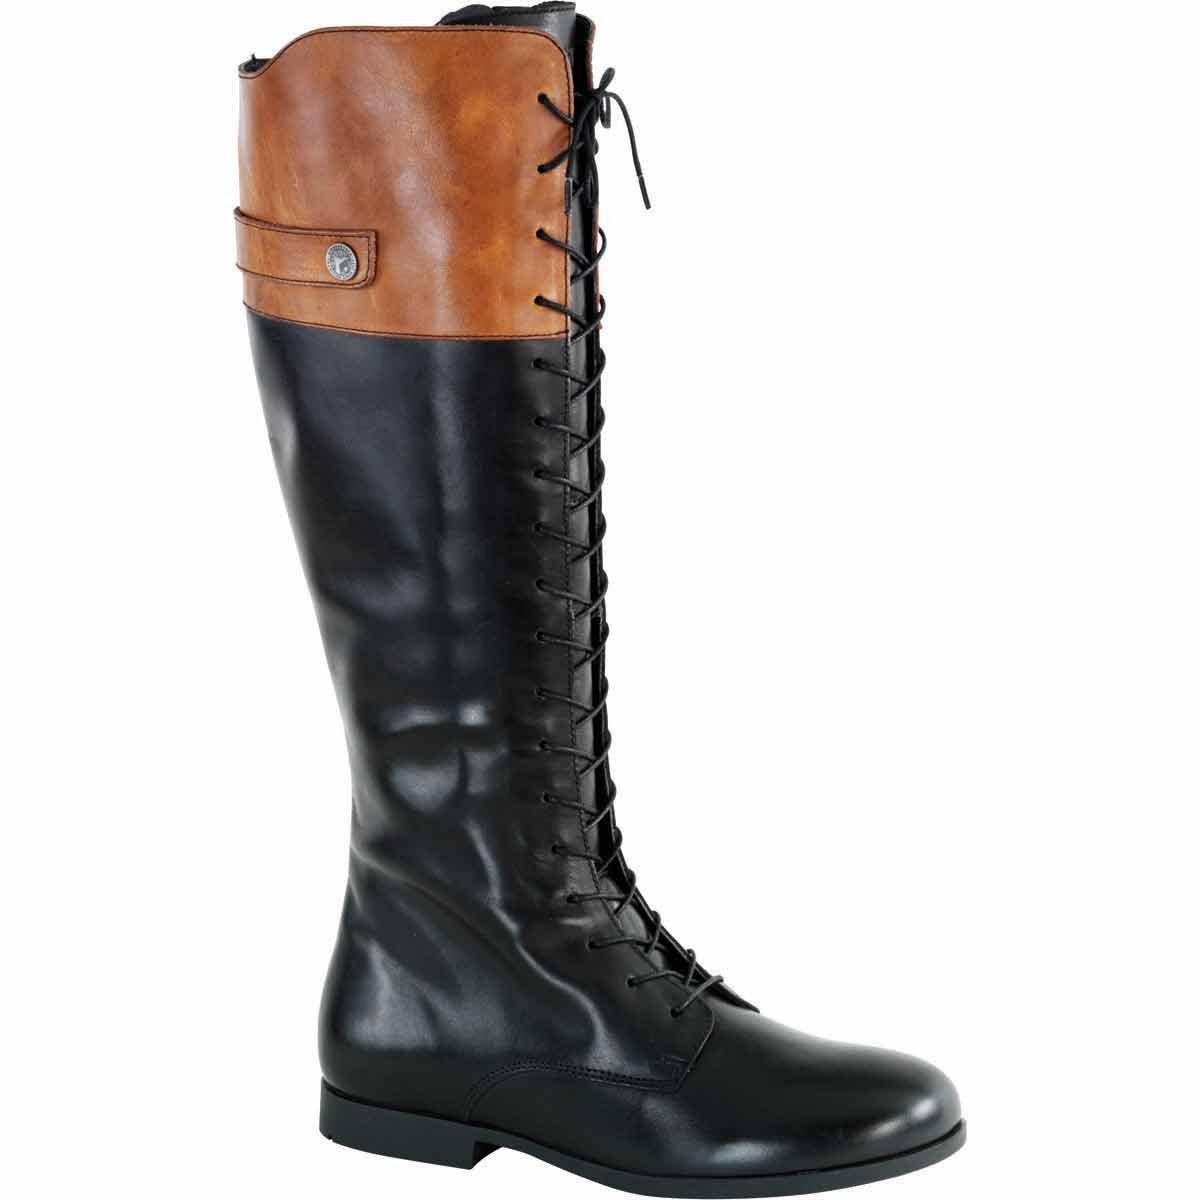 Birkenstock Womens Longford Riding Boot Black/Camel Size 40 EU (9-9.5 M US Women)